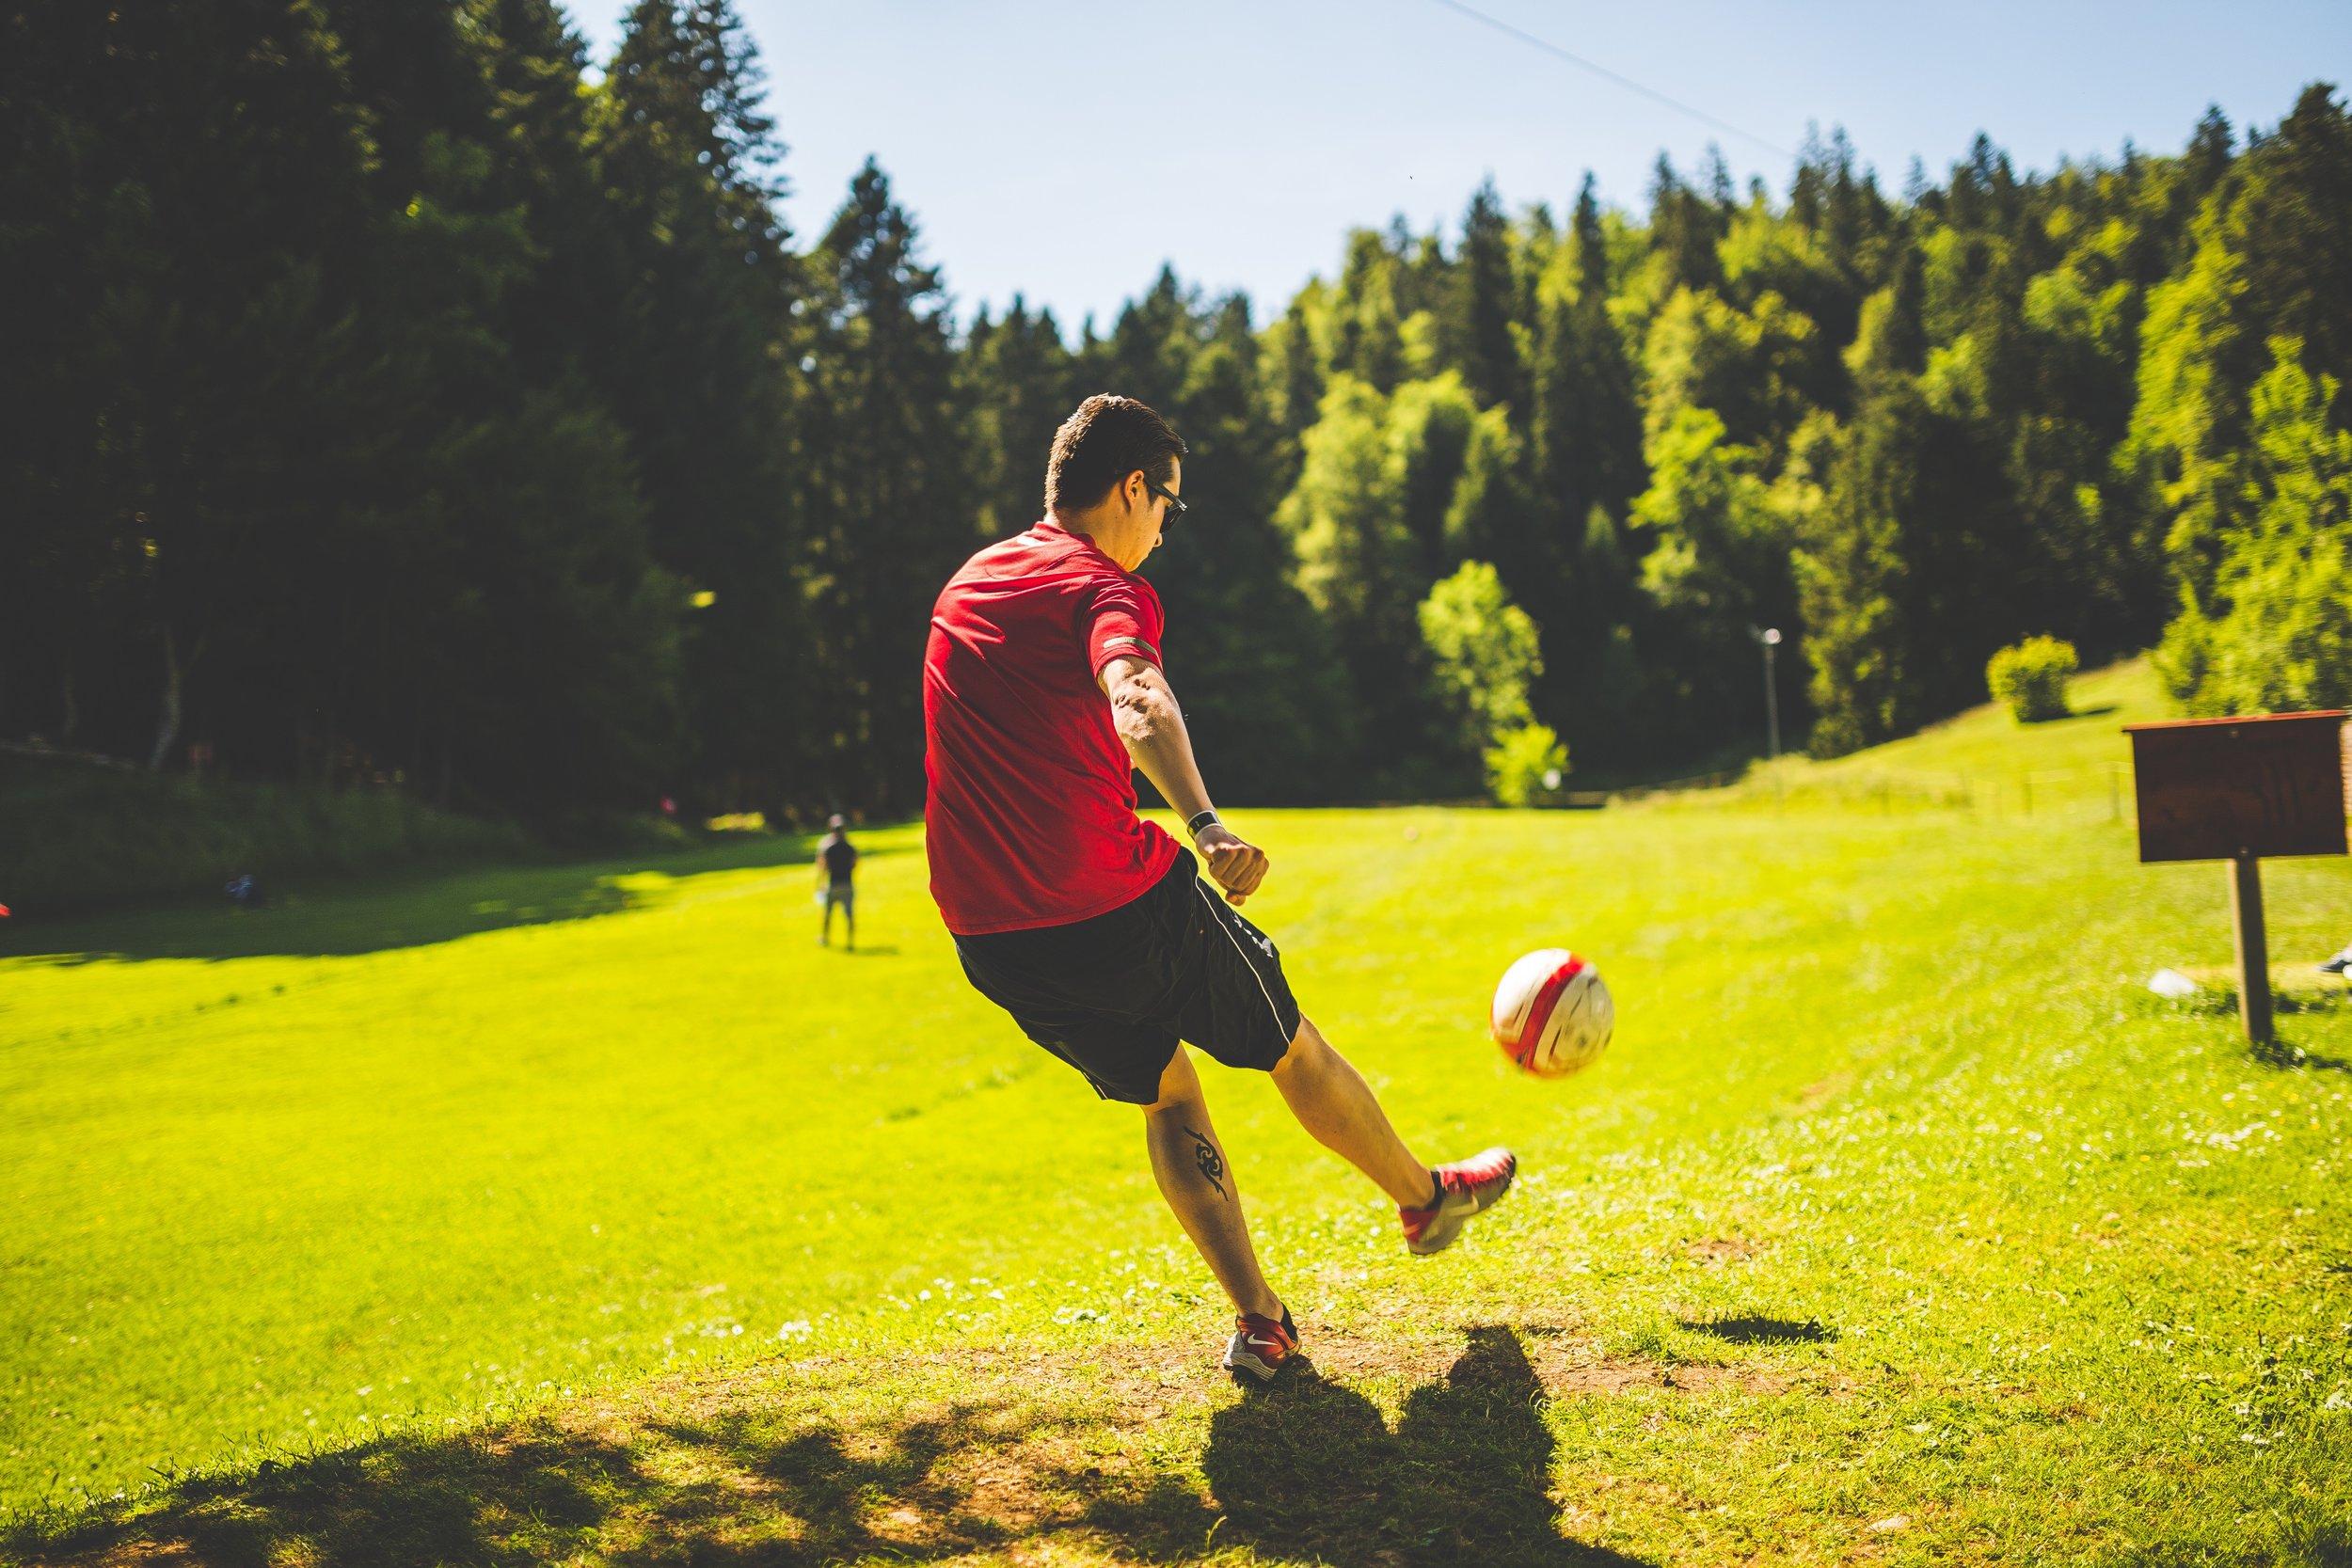 ball-football-game-110080.jpg